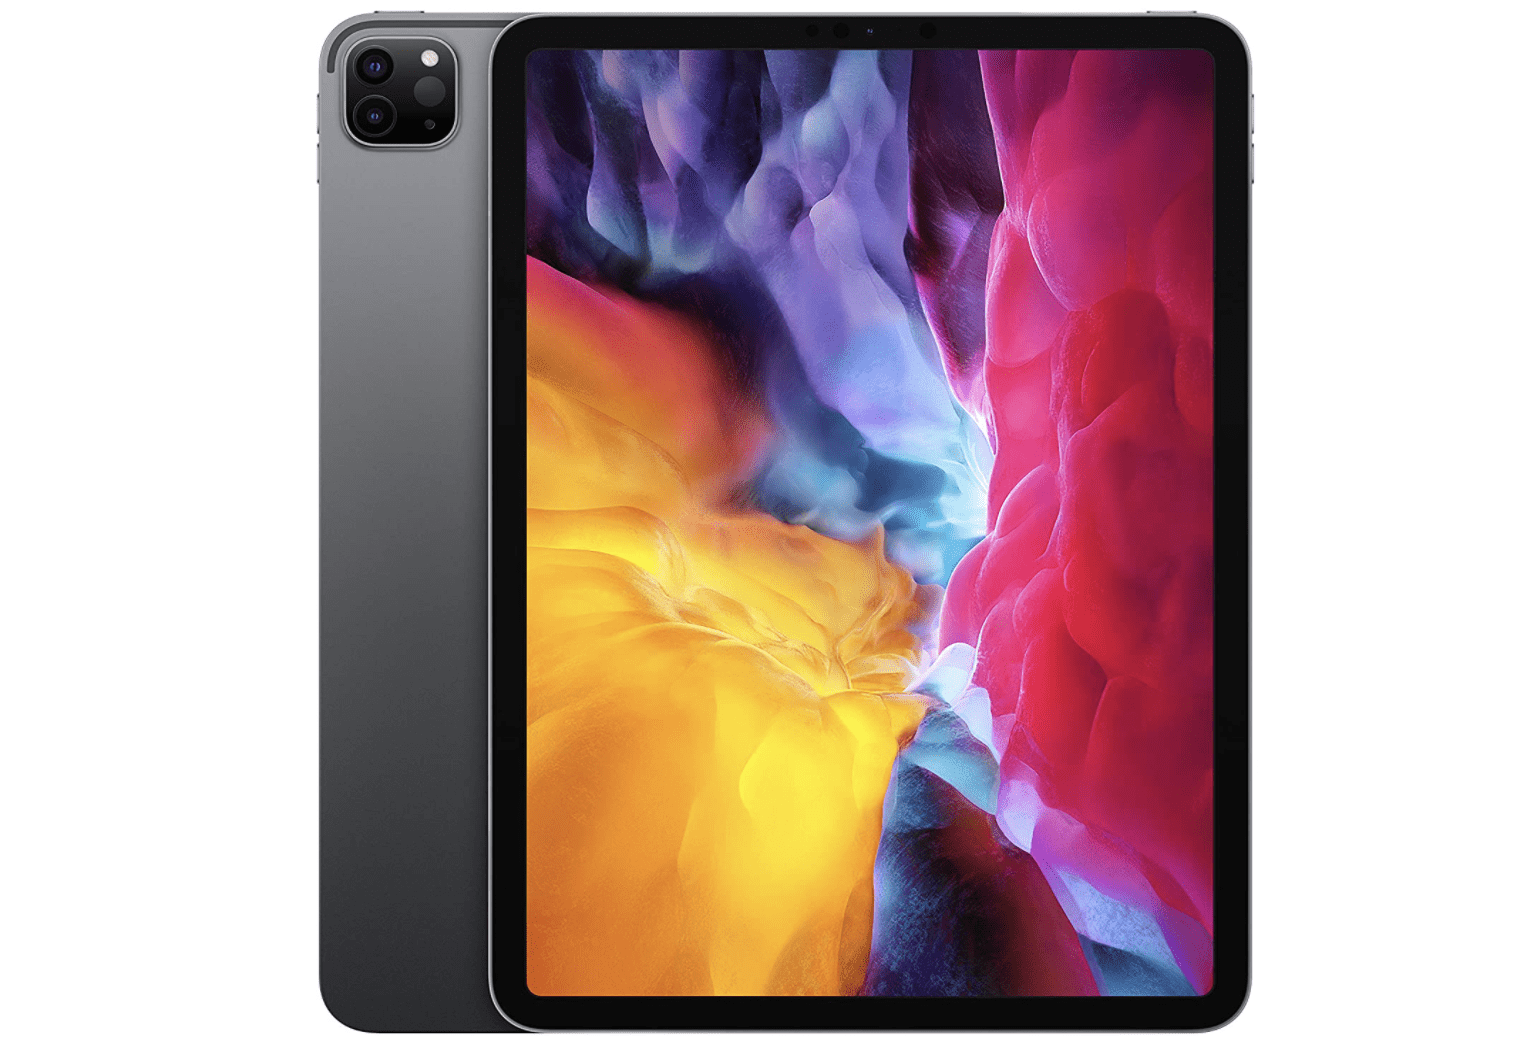 Apple iPad Pro 2021 to feature Mini-Led display instead of OLED as rumored